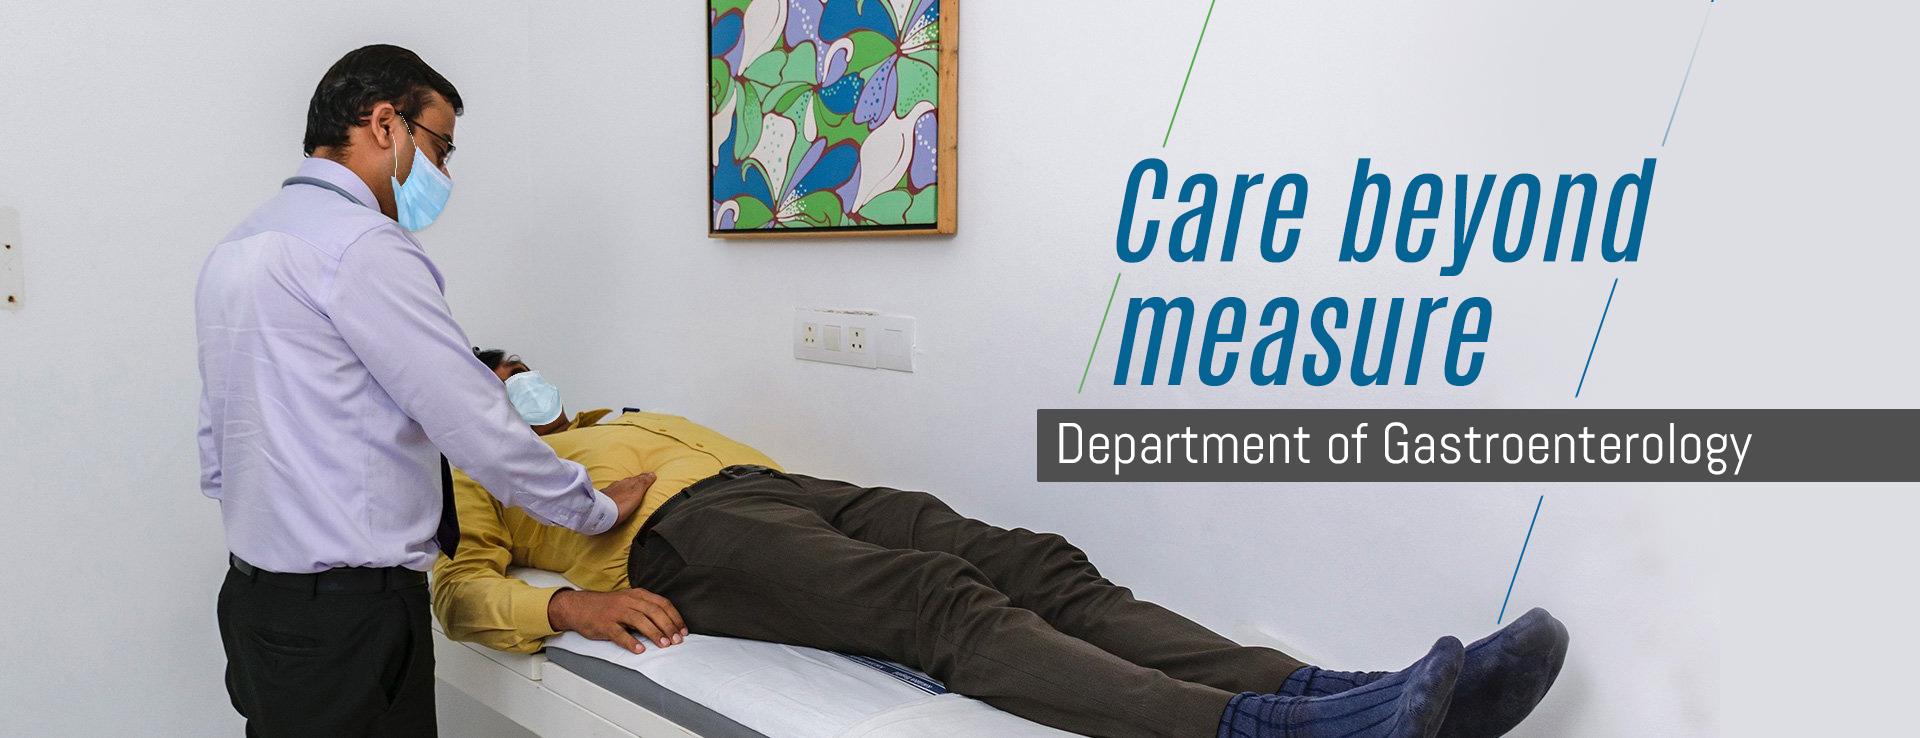 Care beyond measure